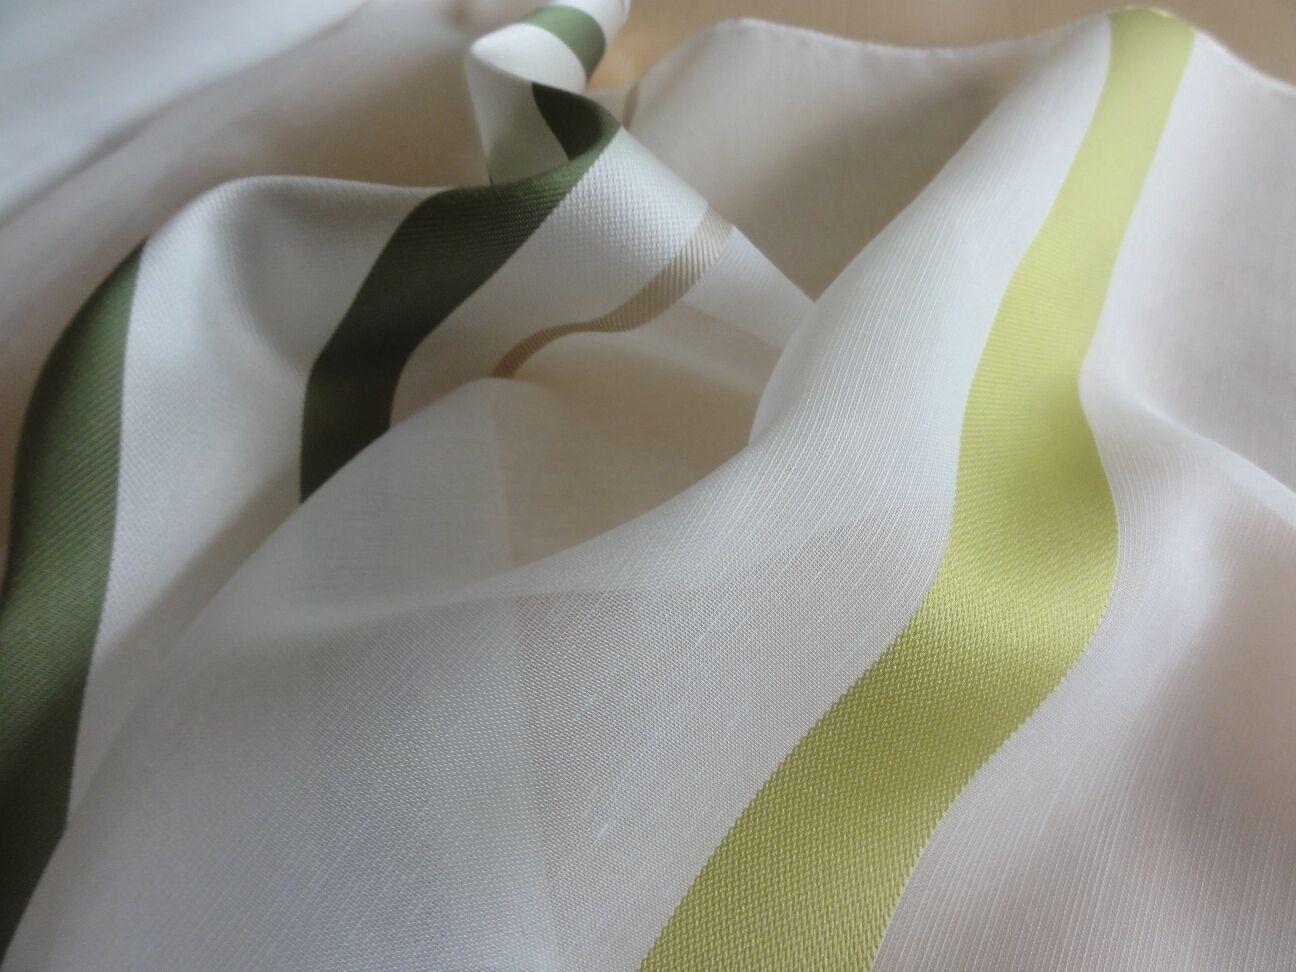 Transparent Ösenvorhang   Fertiggardine Fertiggardine Fertiggardine Tanaro in 5 Farben | Sonderaktionen zum Jahresende  304fef